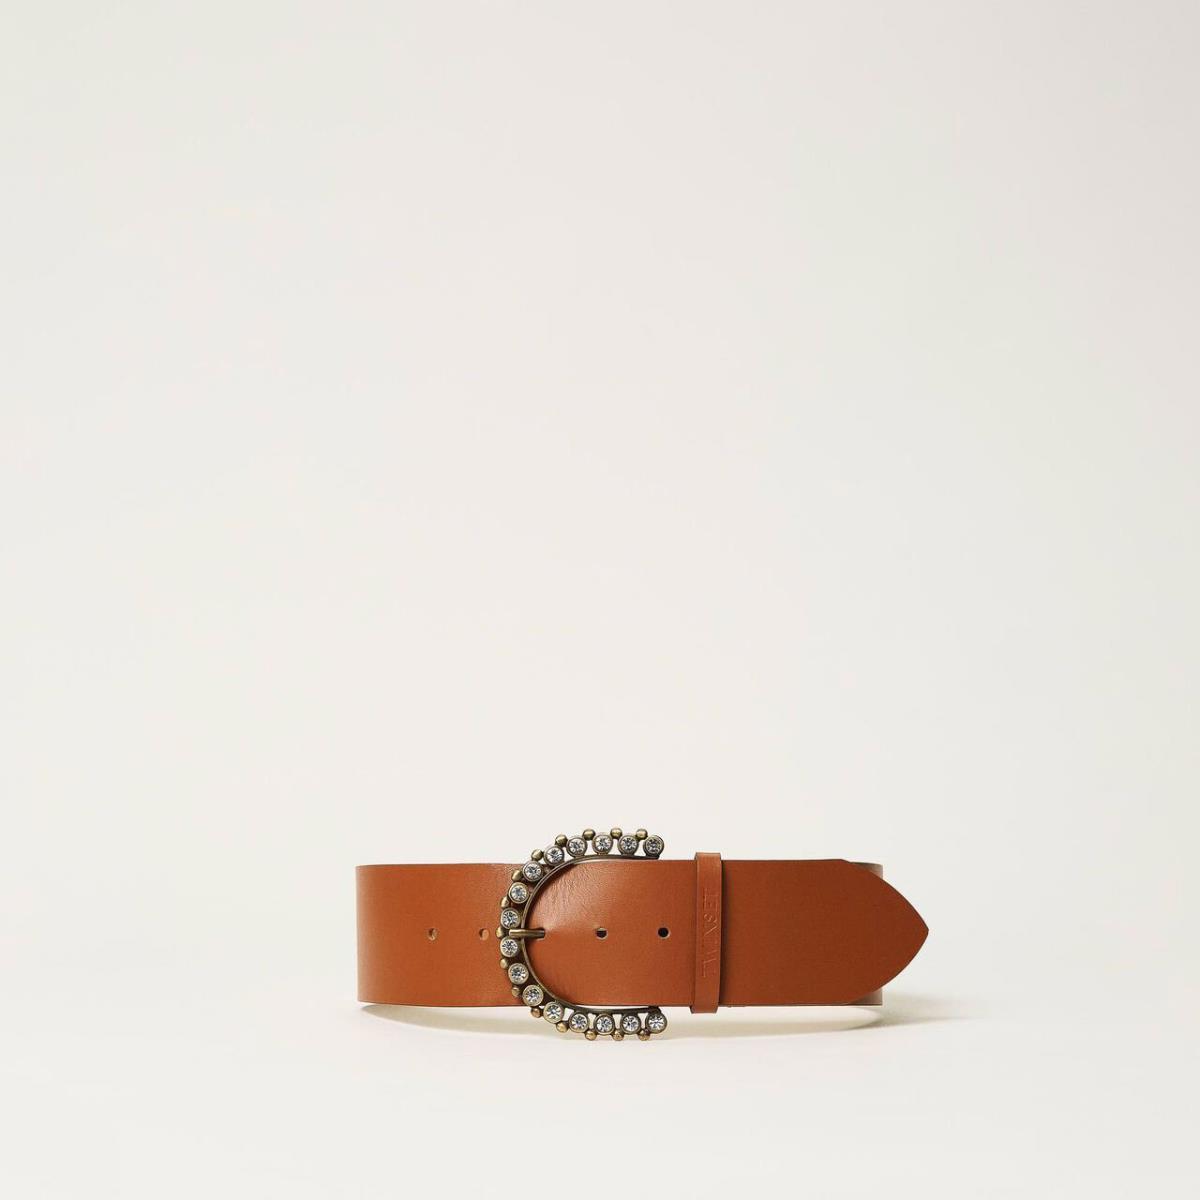 Cintura donna in cuoi Twinset Accessori   211T0506100057